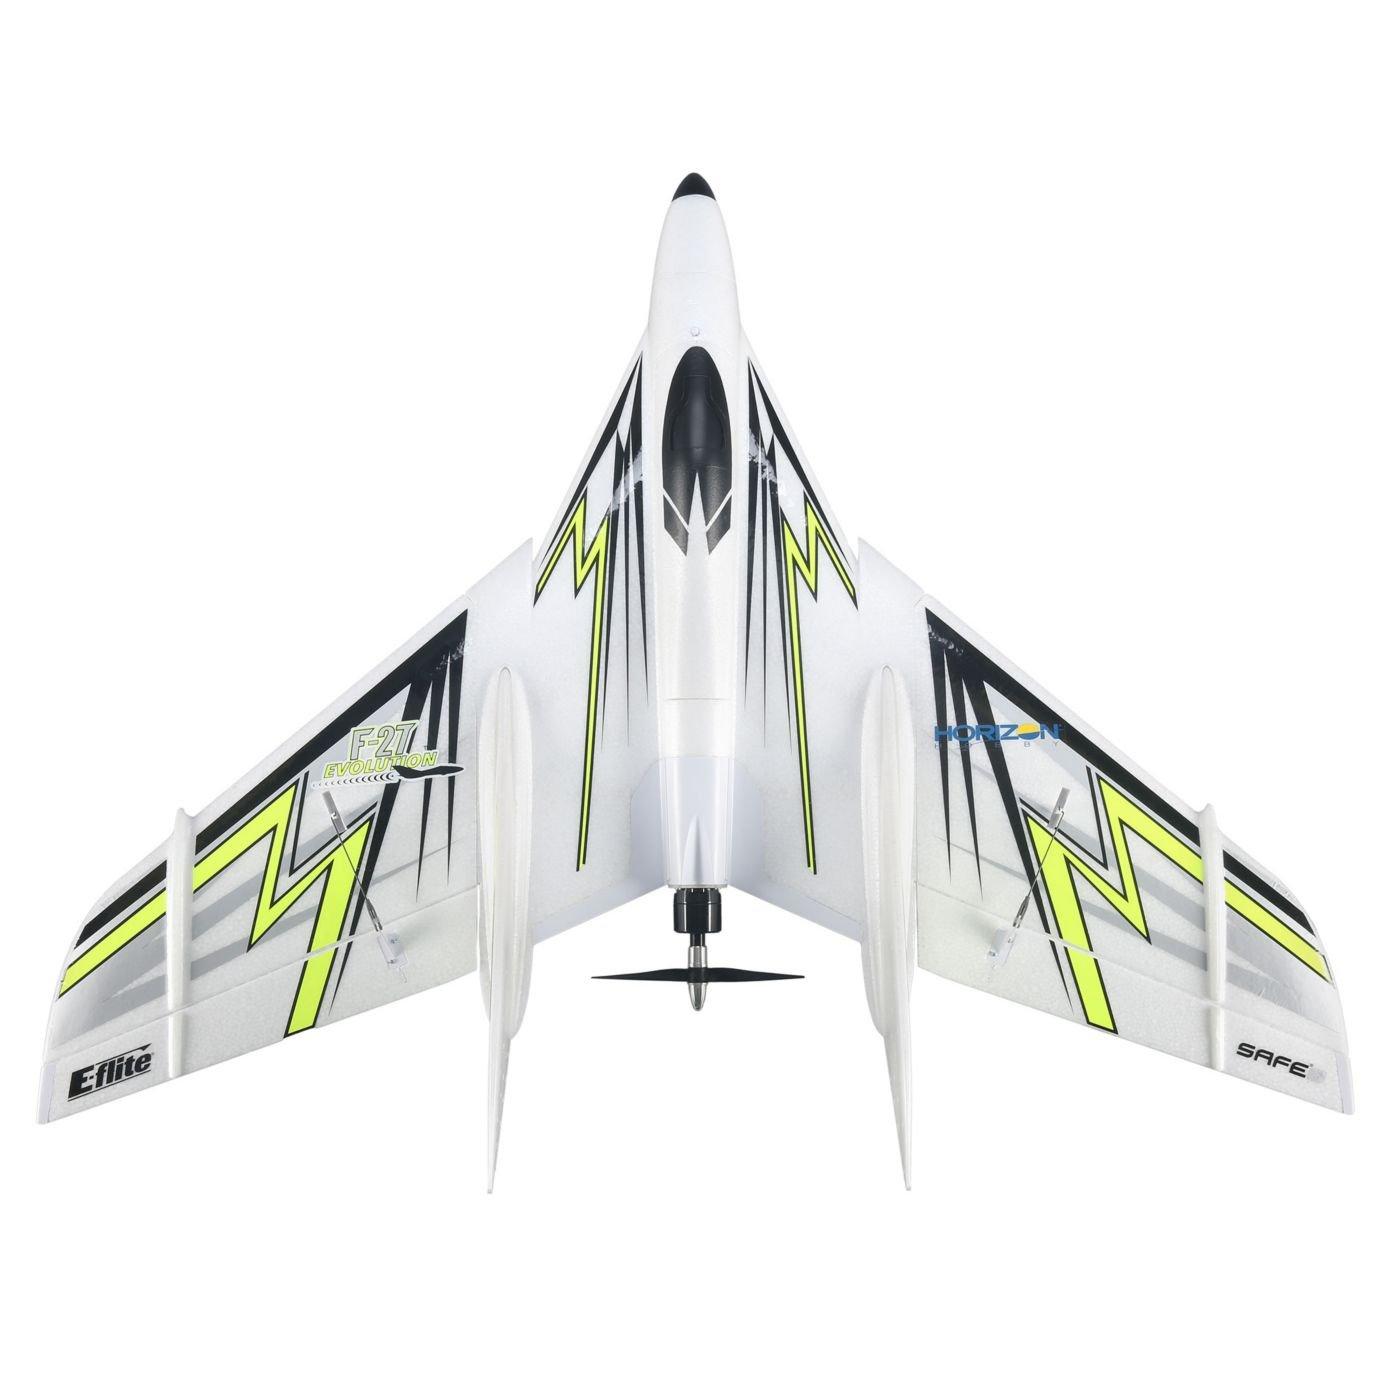 F-27 Evolution BNF Basic